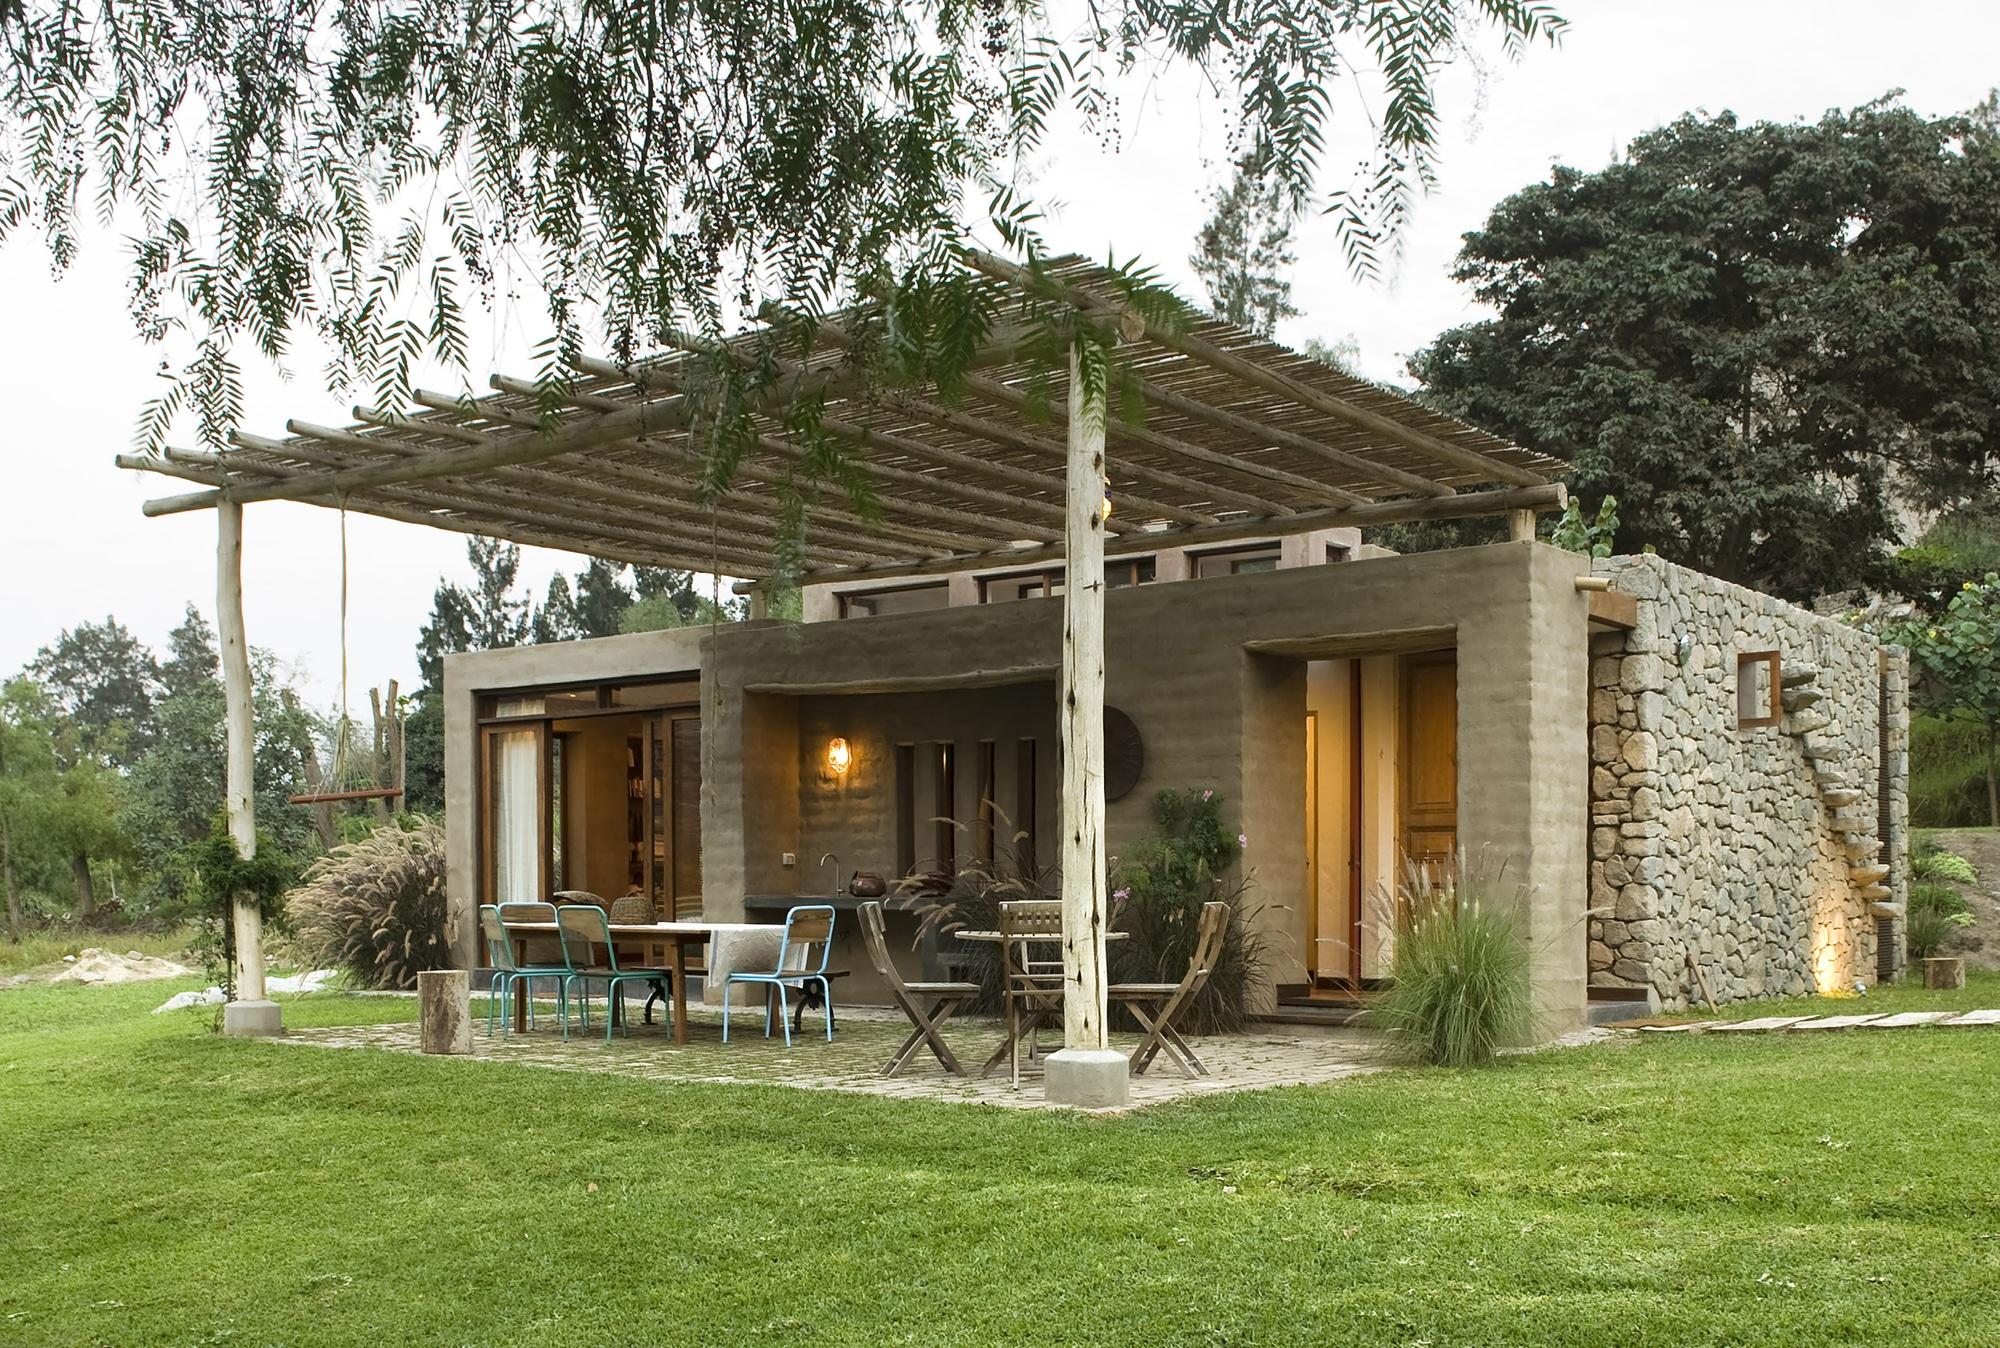 Dise os de casas de campo construye hogar for Casa y ideas